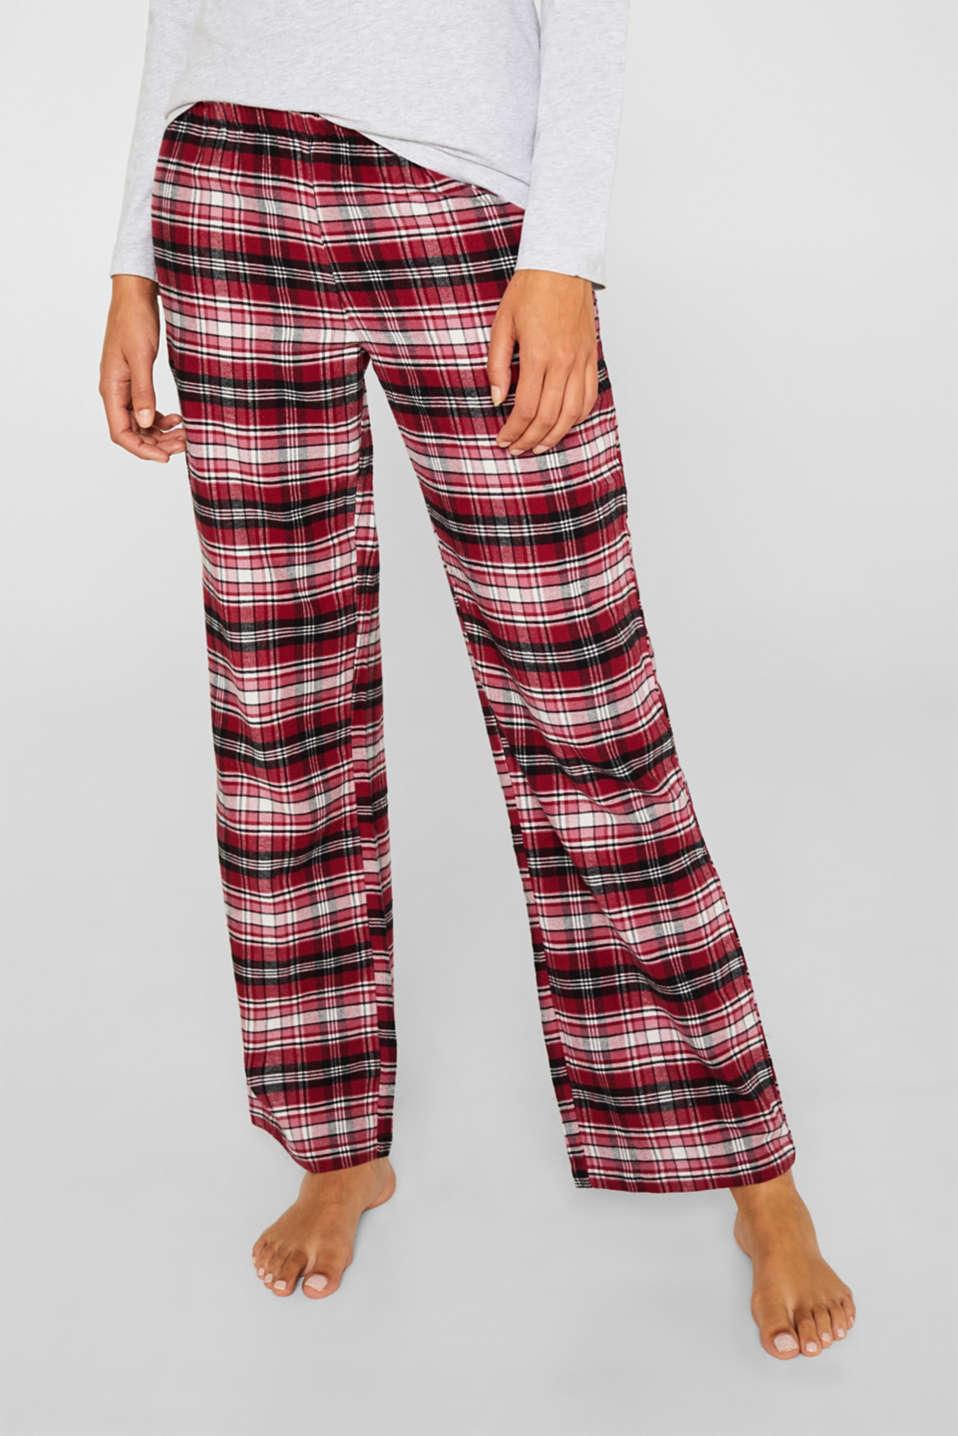 Jersey/flannel pyjamas, 100% cotton, DARK RED, detail image number 6